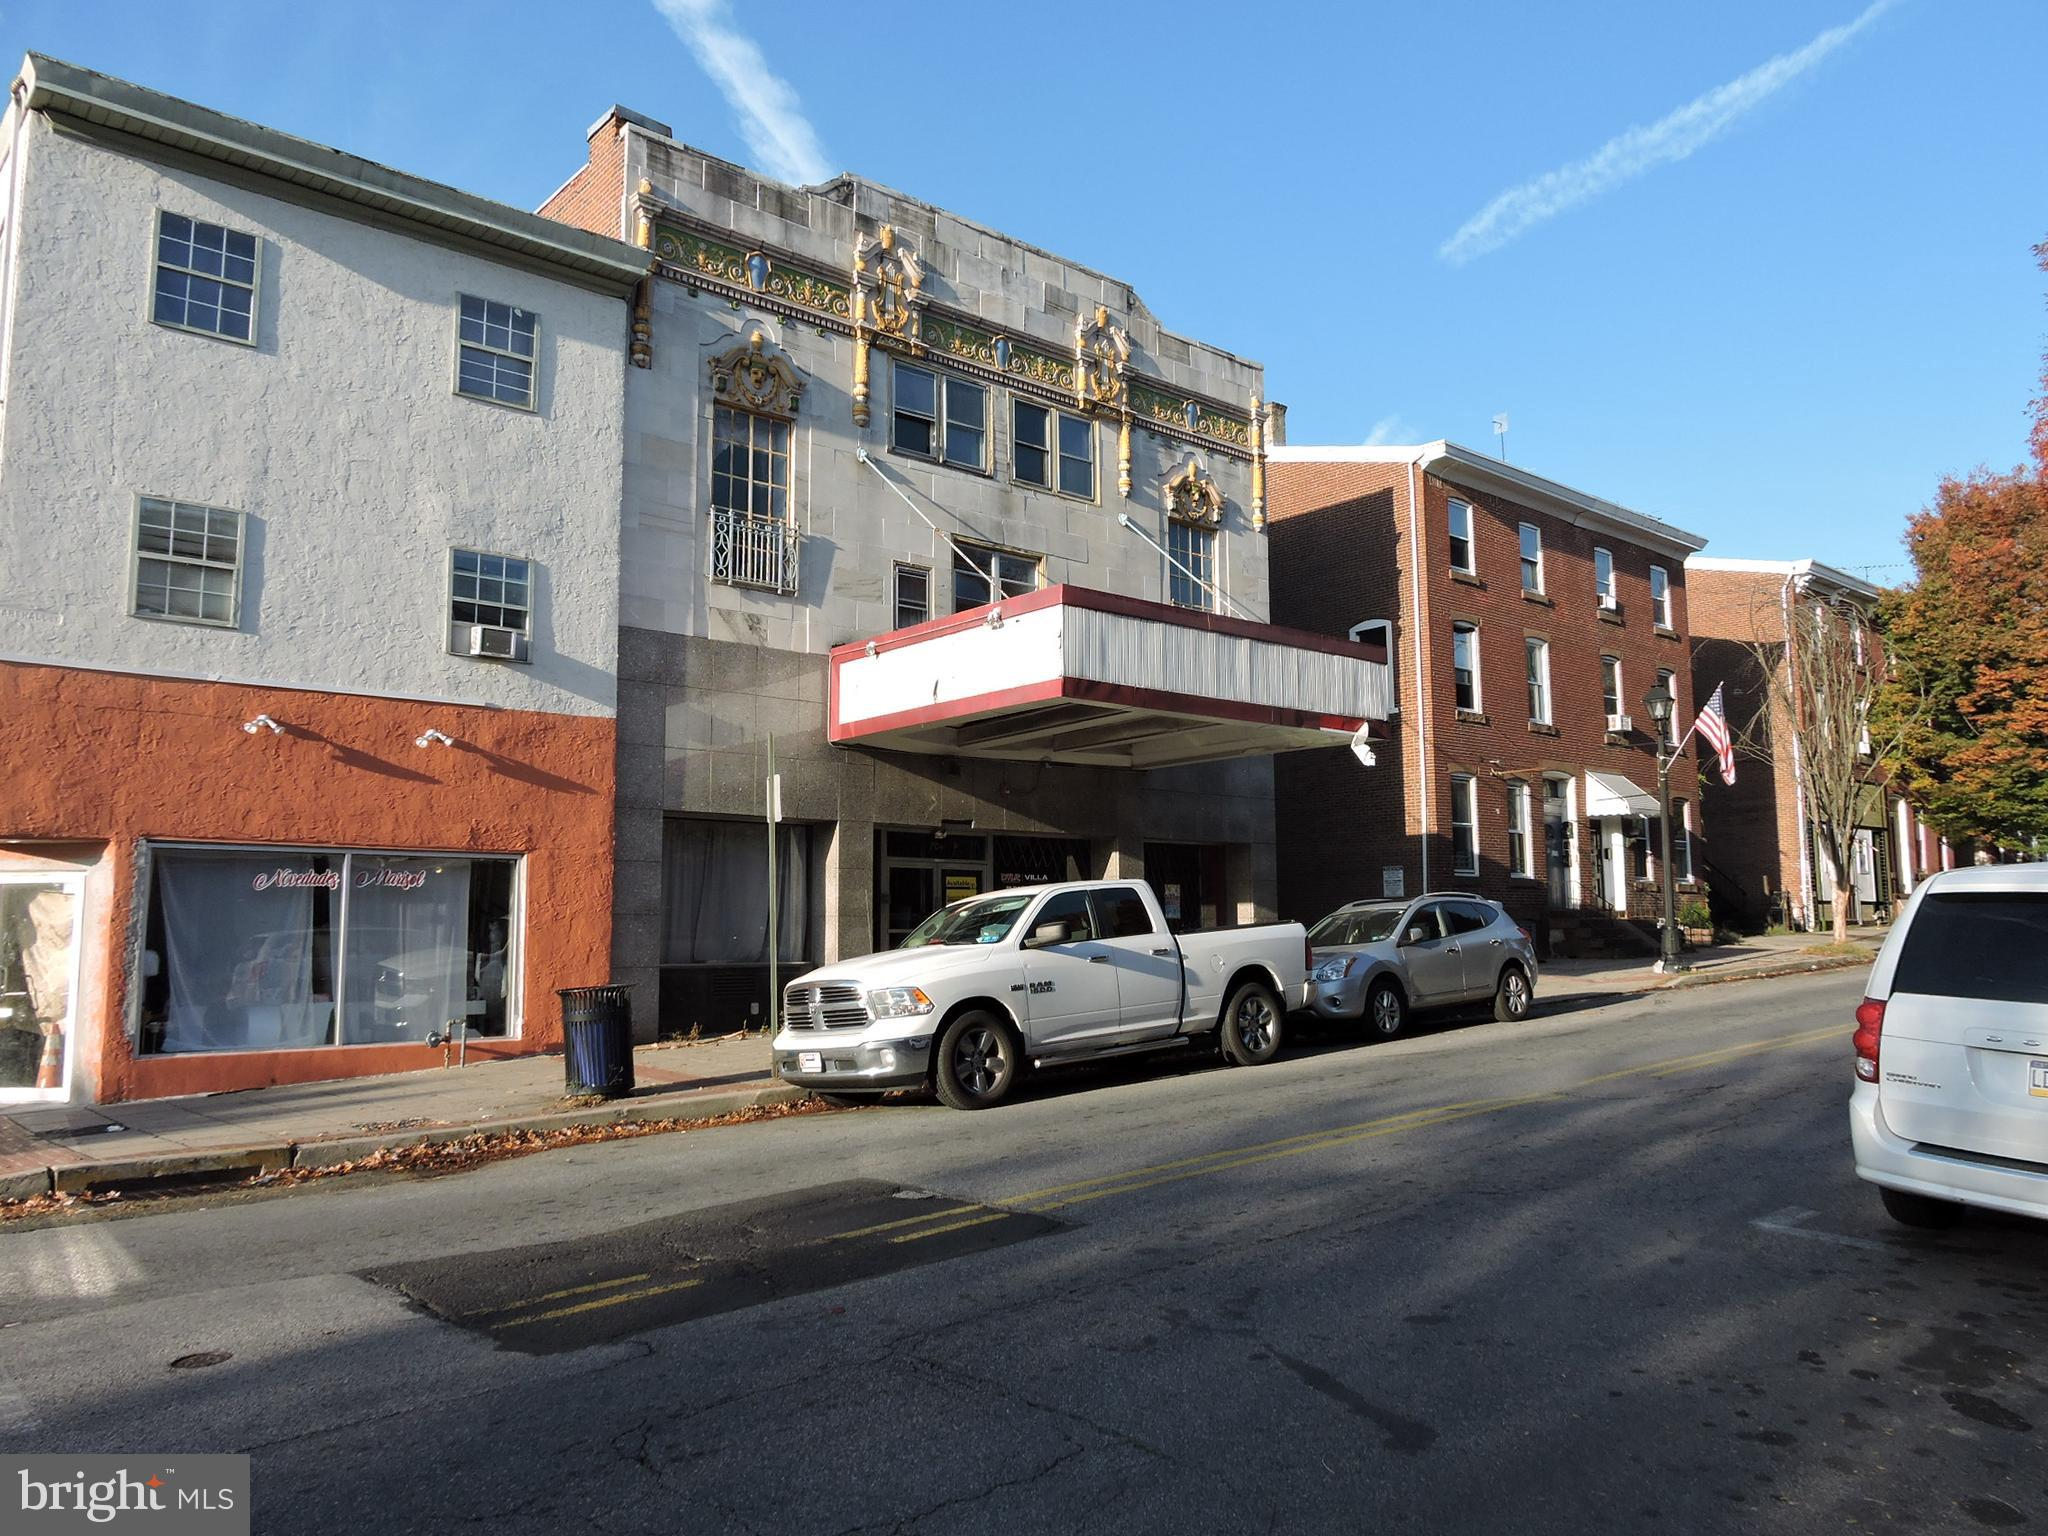 704 W MARSHALL STREET, NORRISTOWN, PA 19401